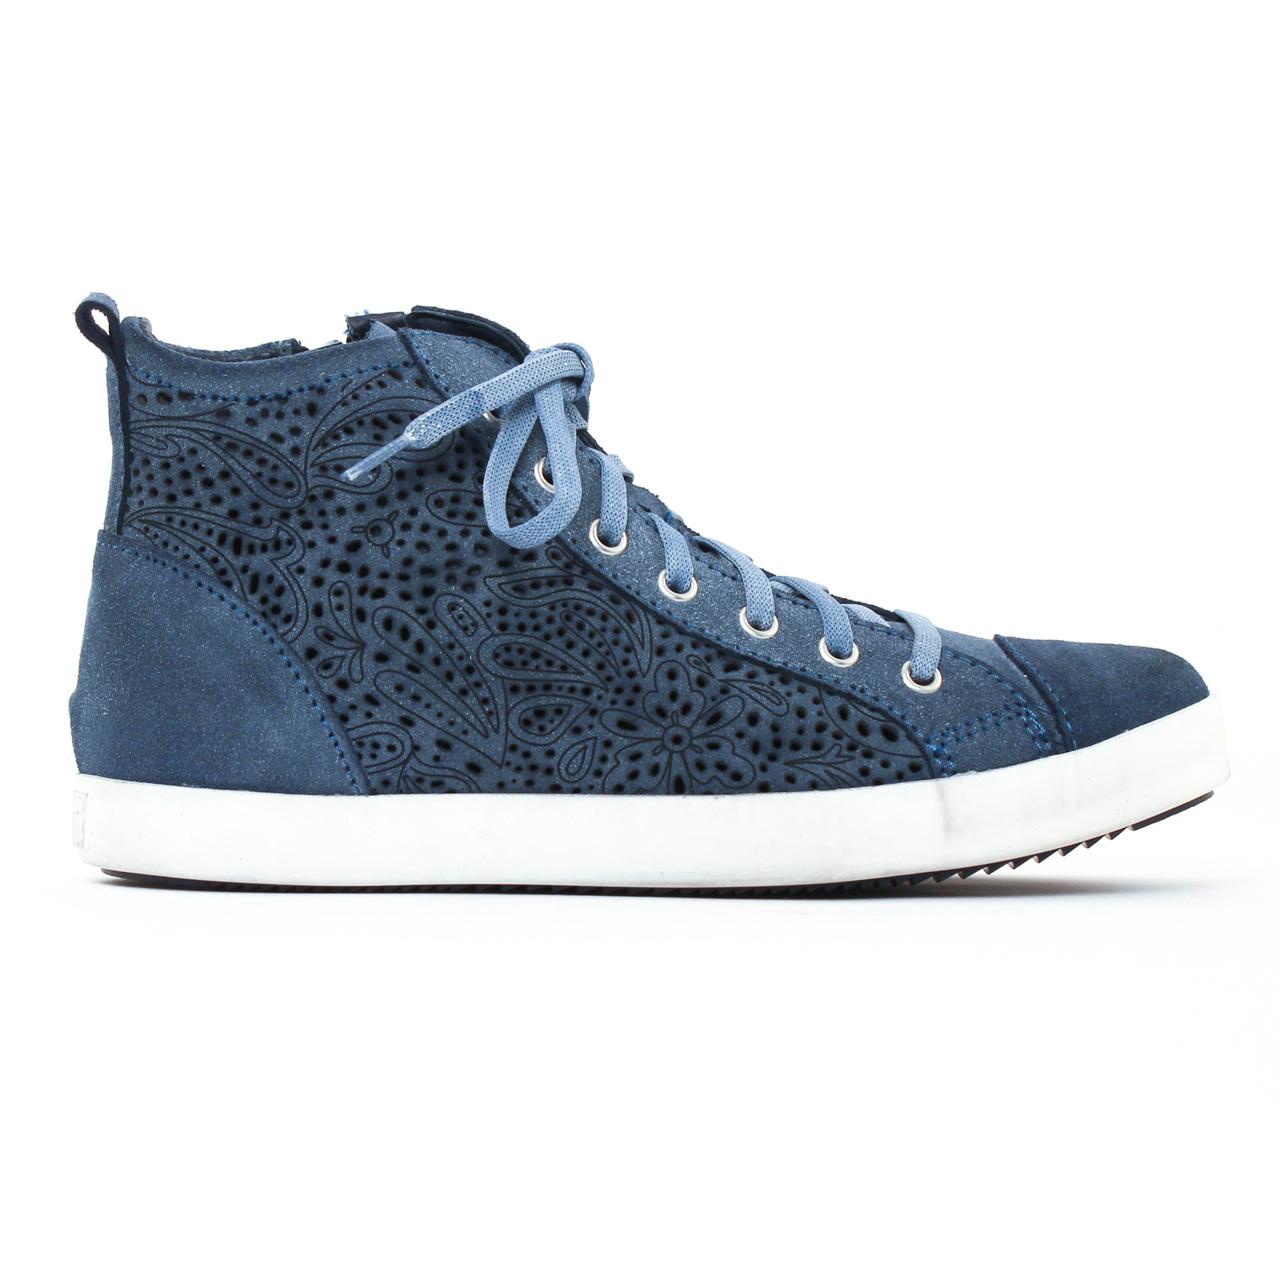 Tamaris 25214 Denim Chaussures femmes printemps été Femme